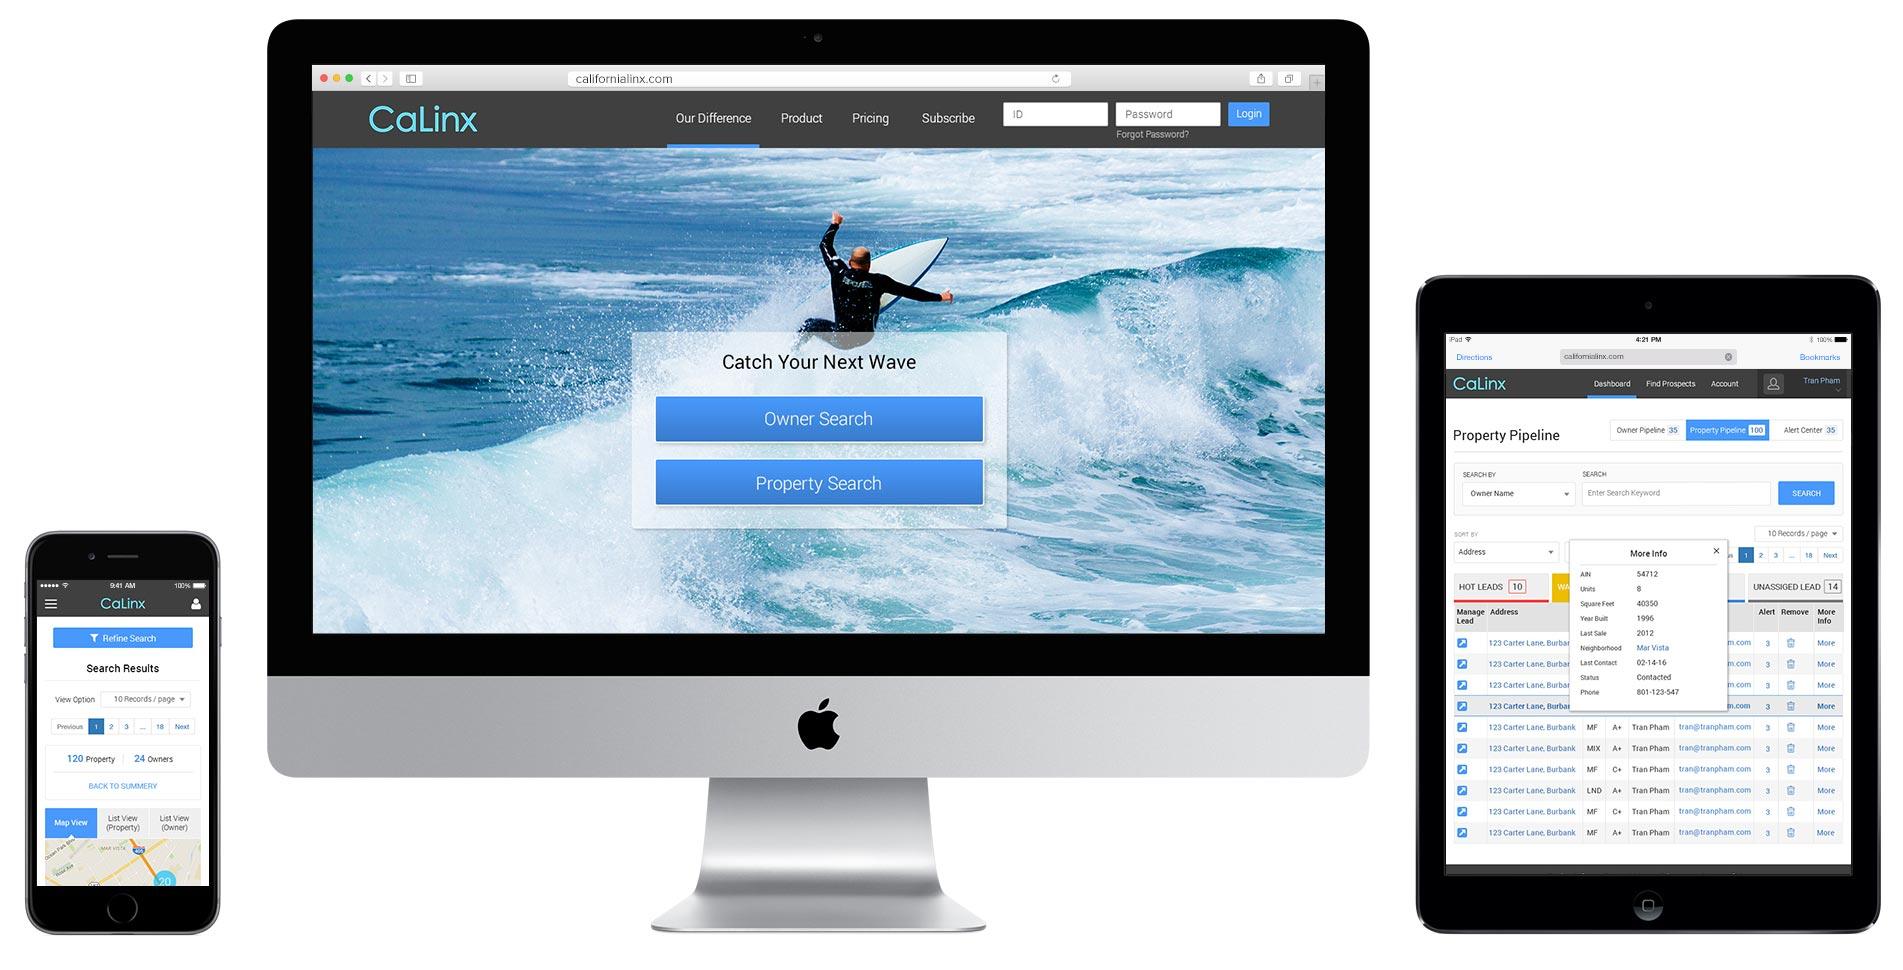 calinx-web-mob-apps-device-screens